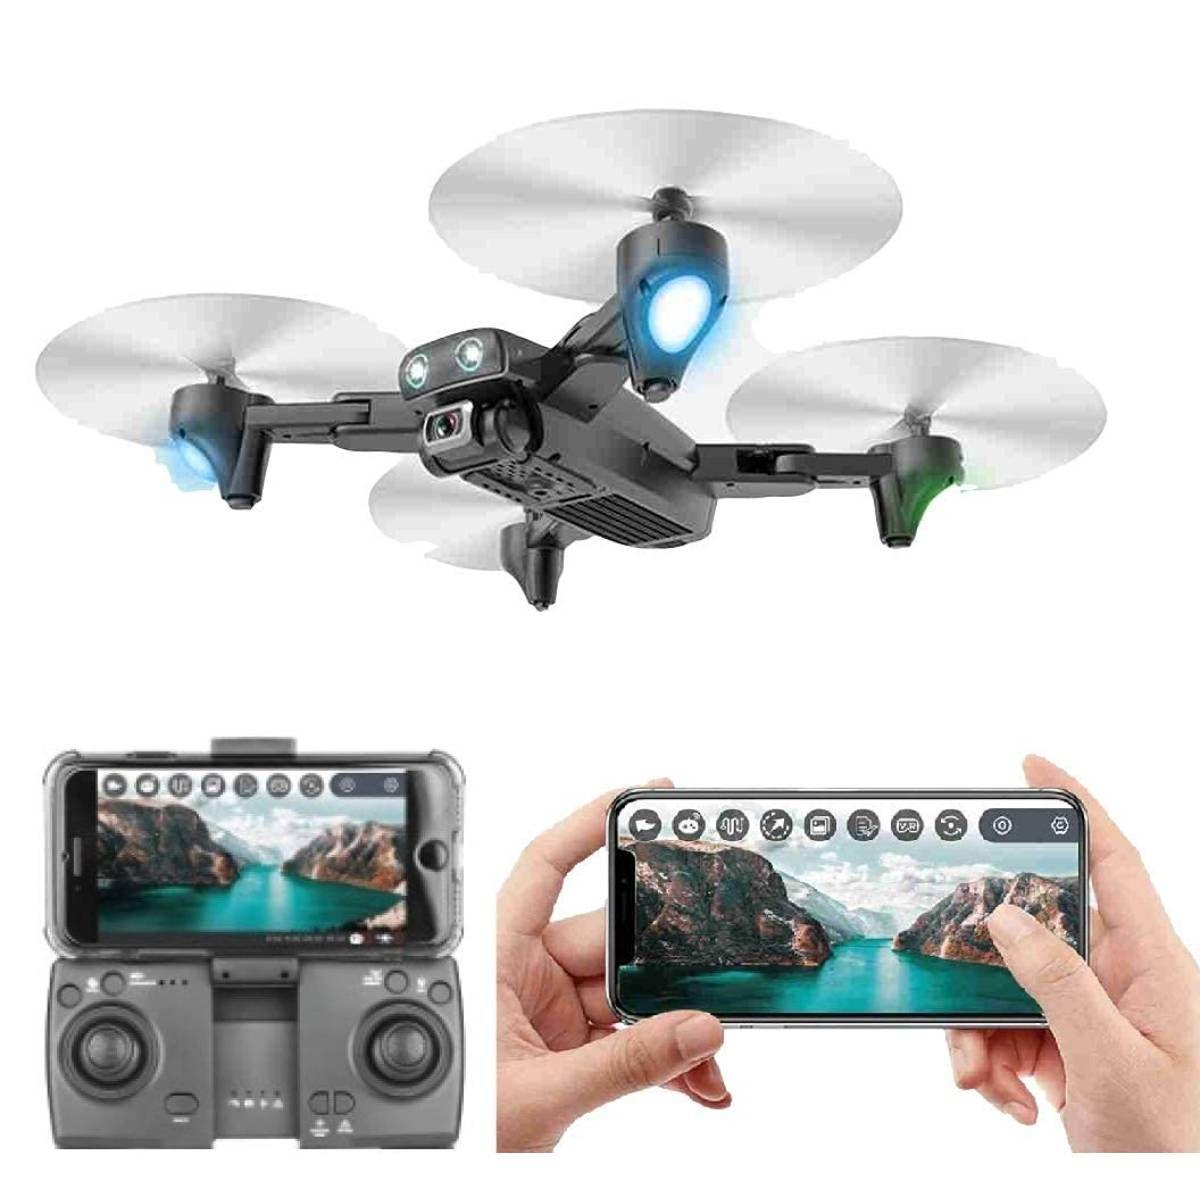 Livox Drone